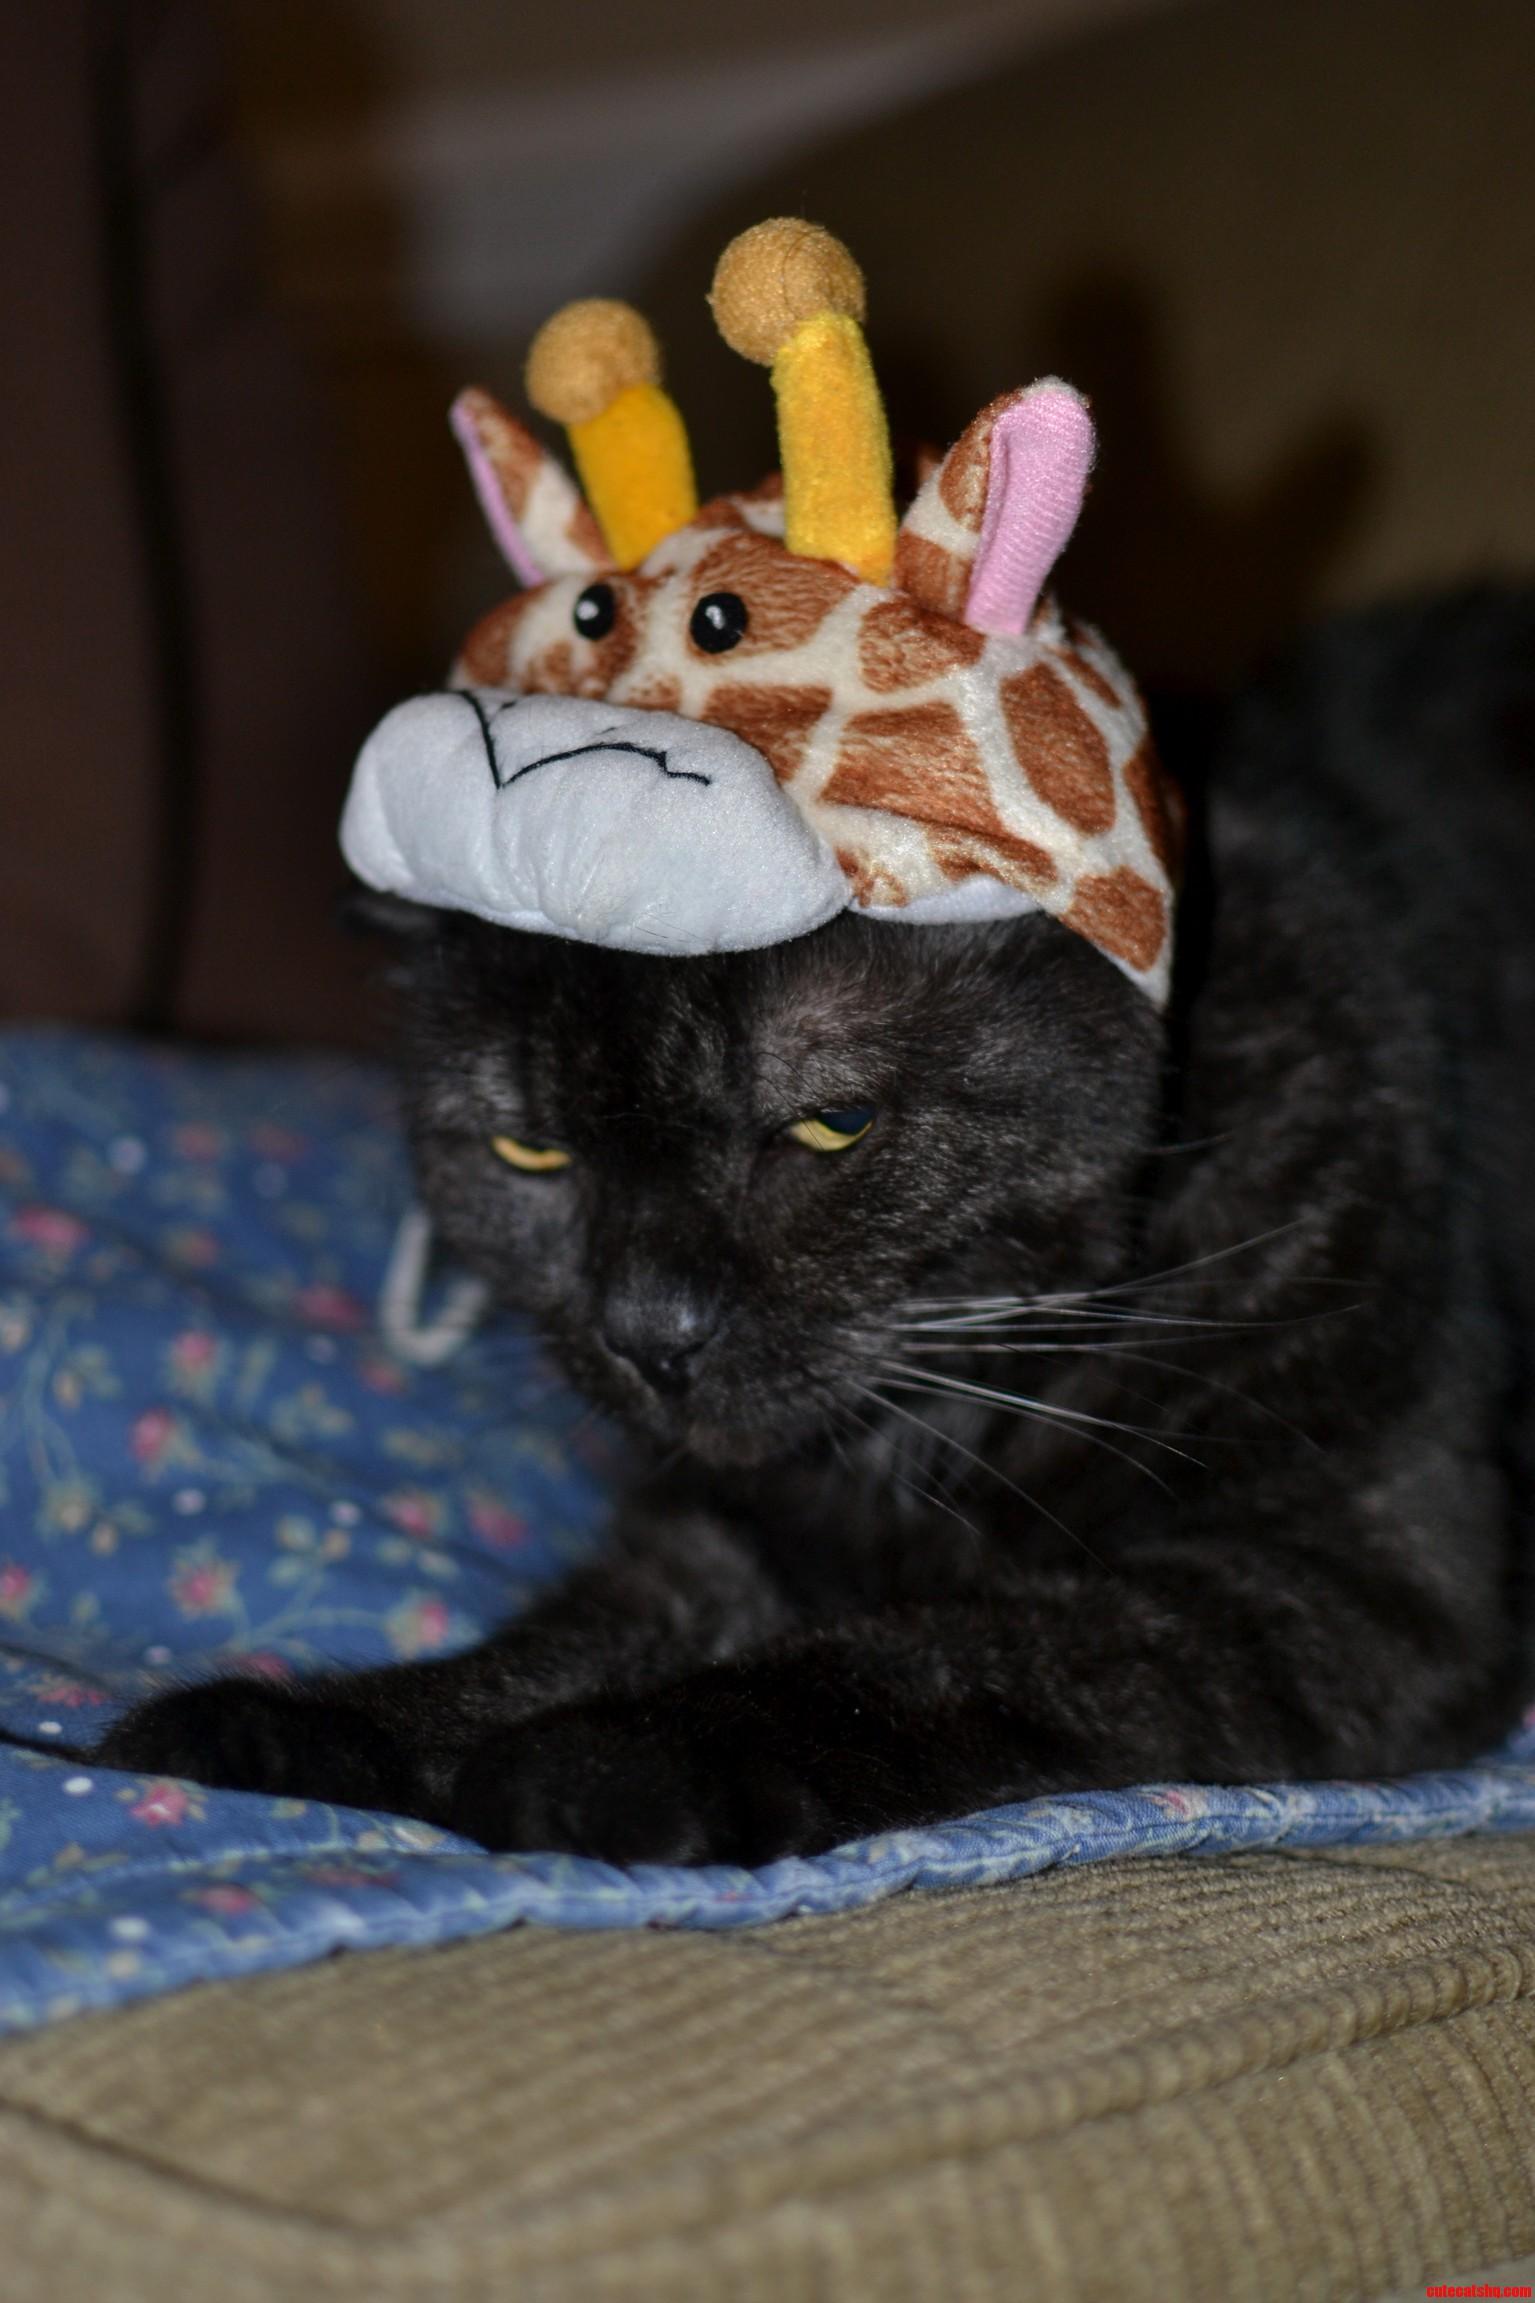 The Mad Giraffe Kitty